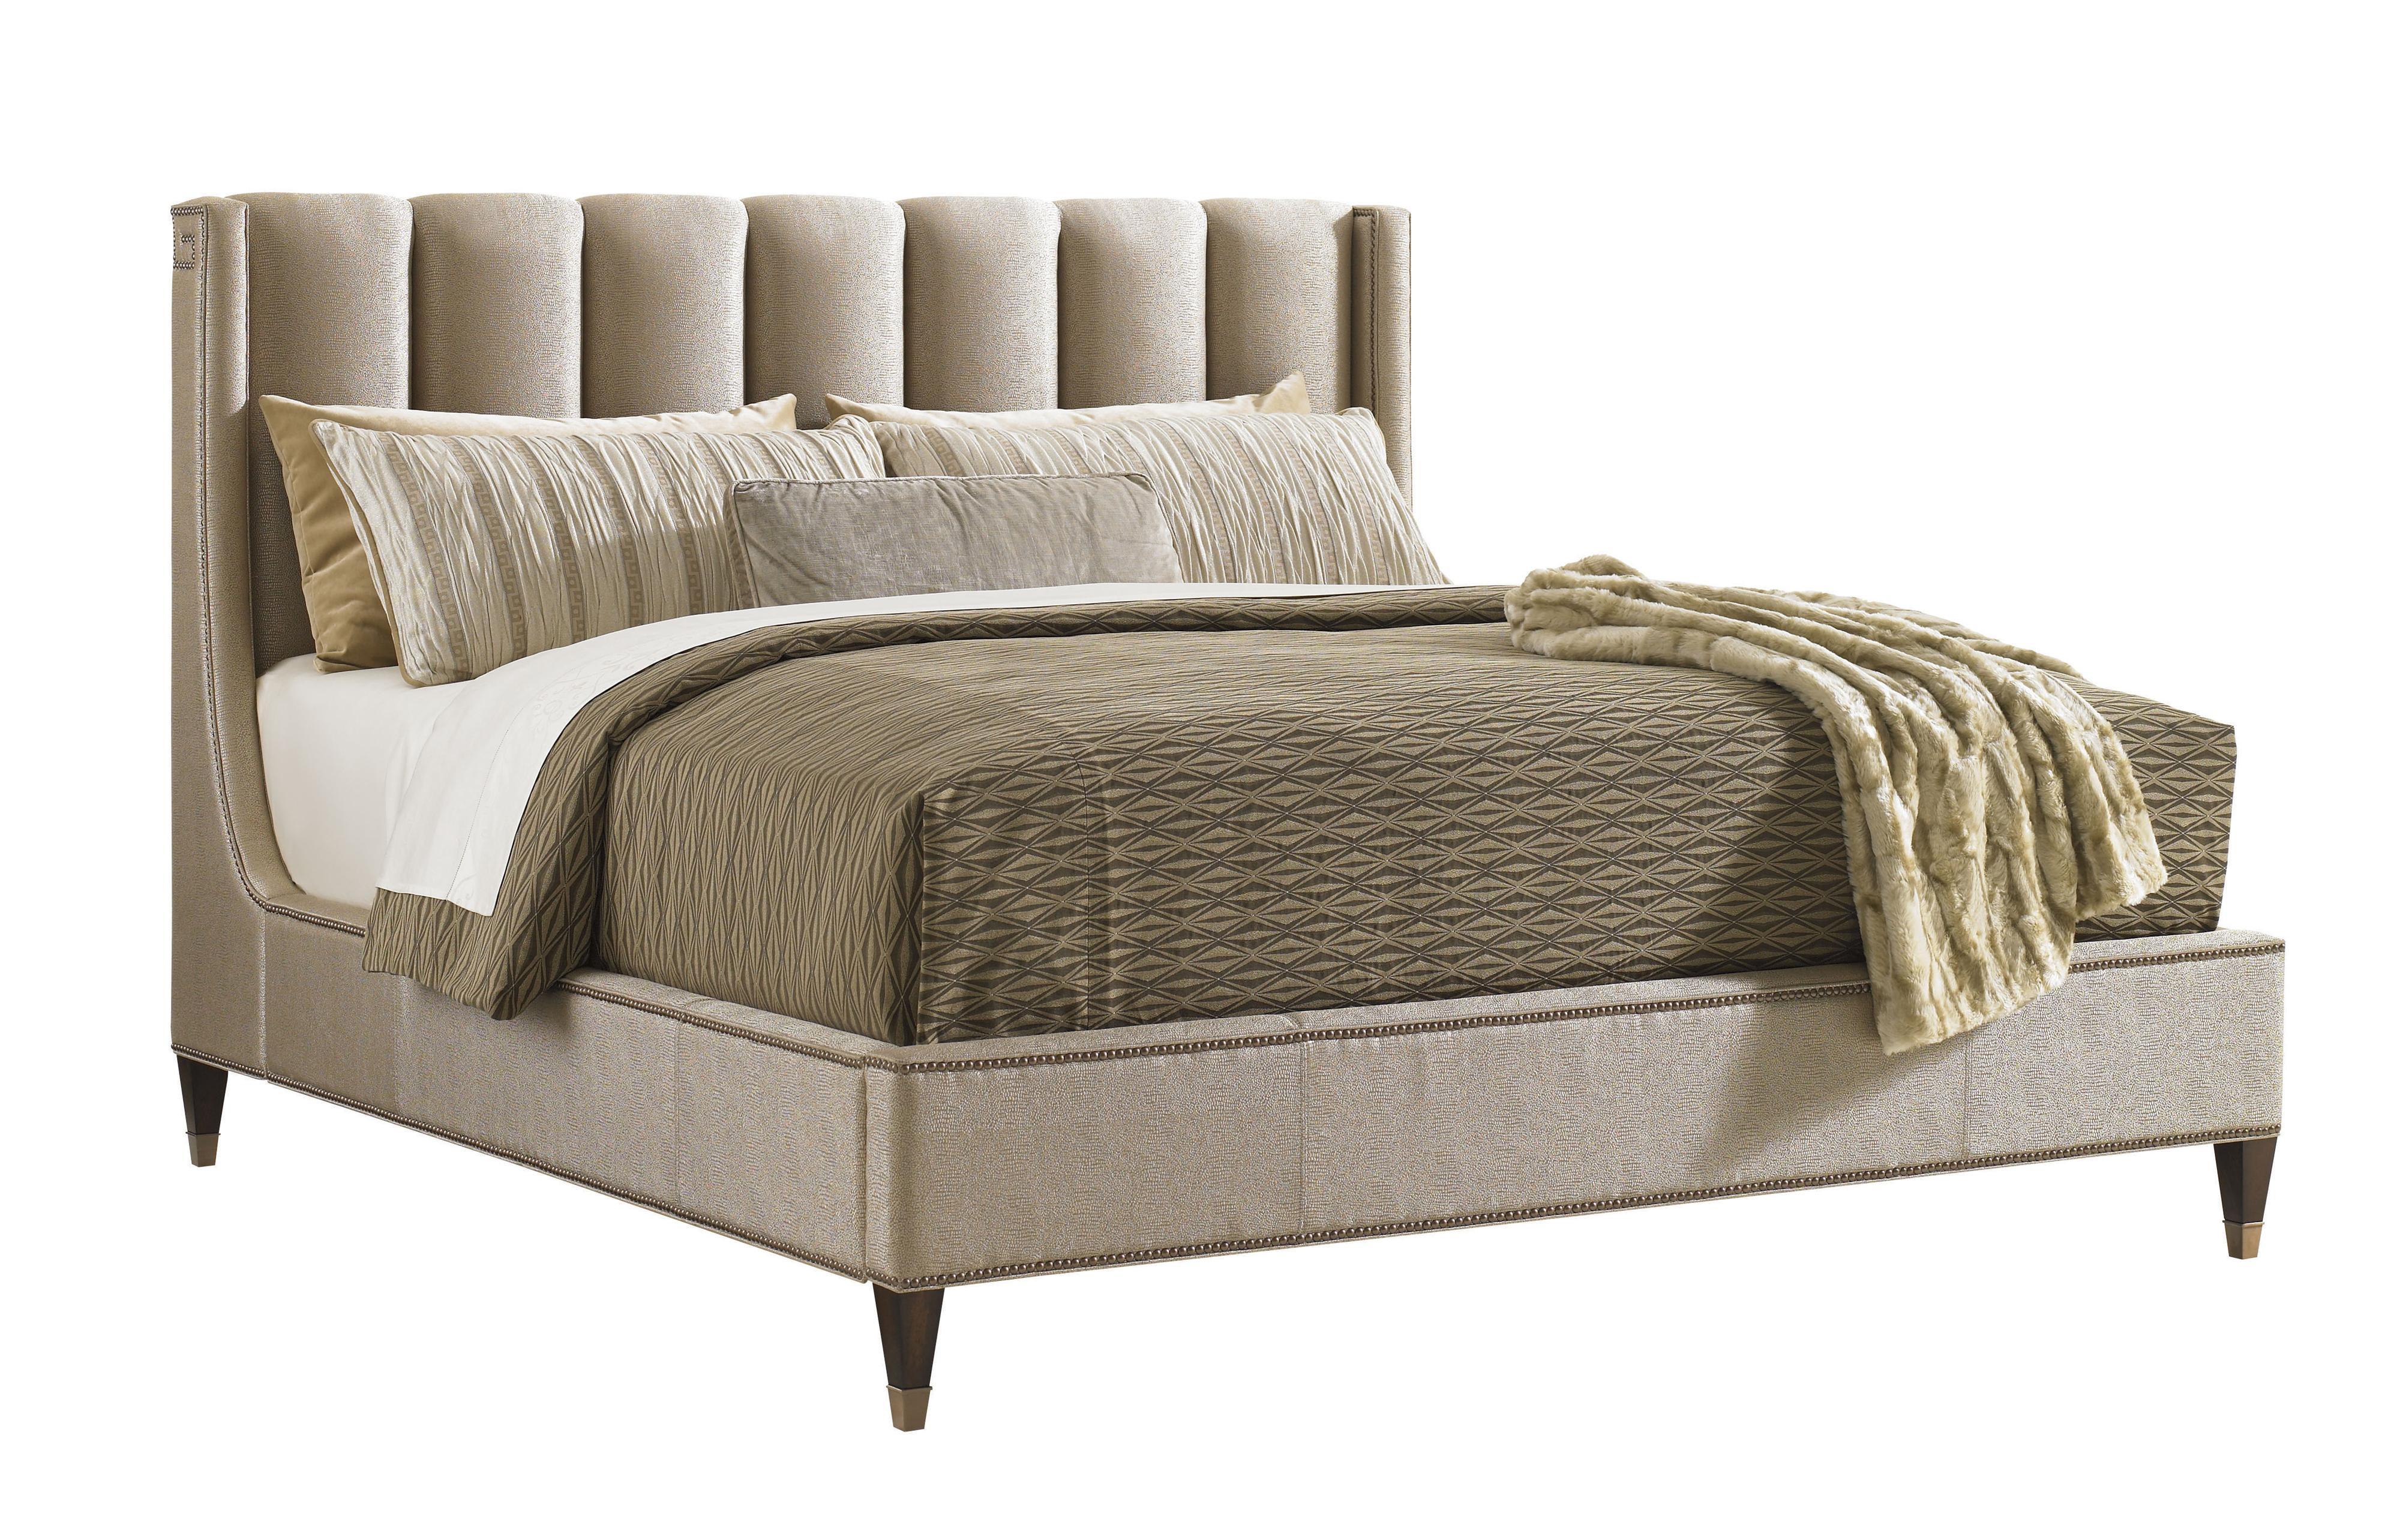 Queen Barrington Upholstered Bed